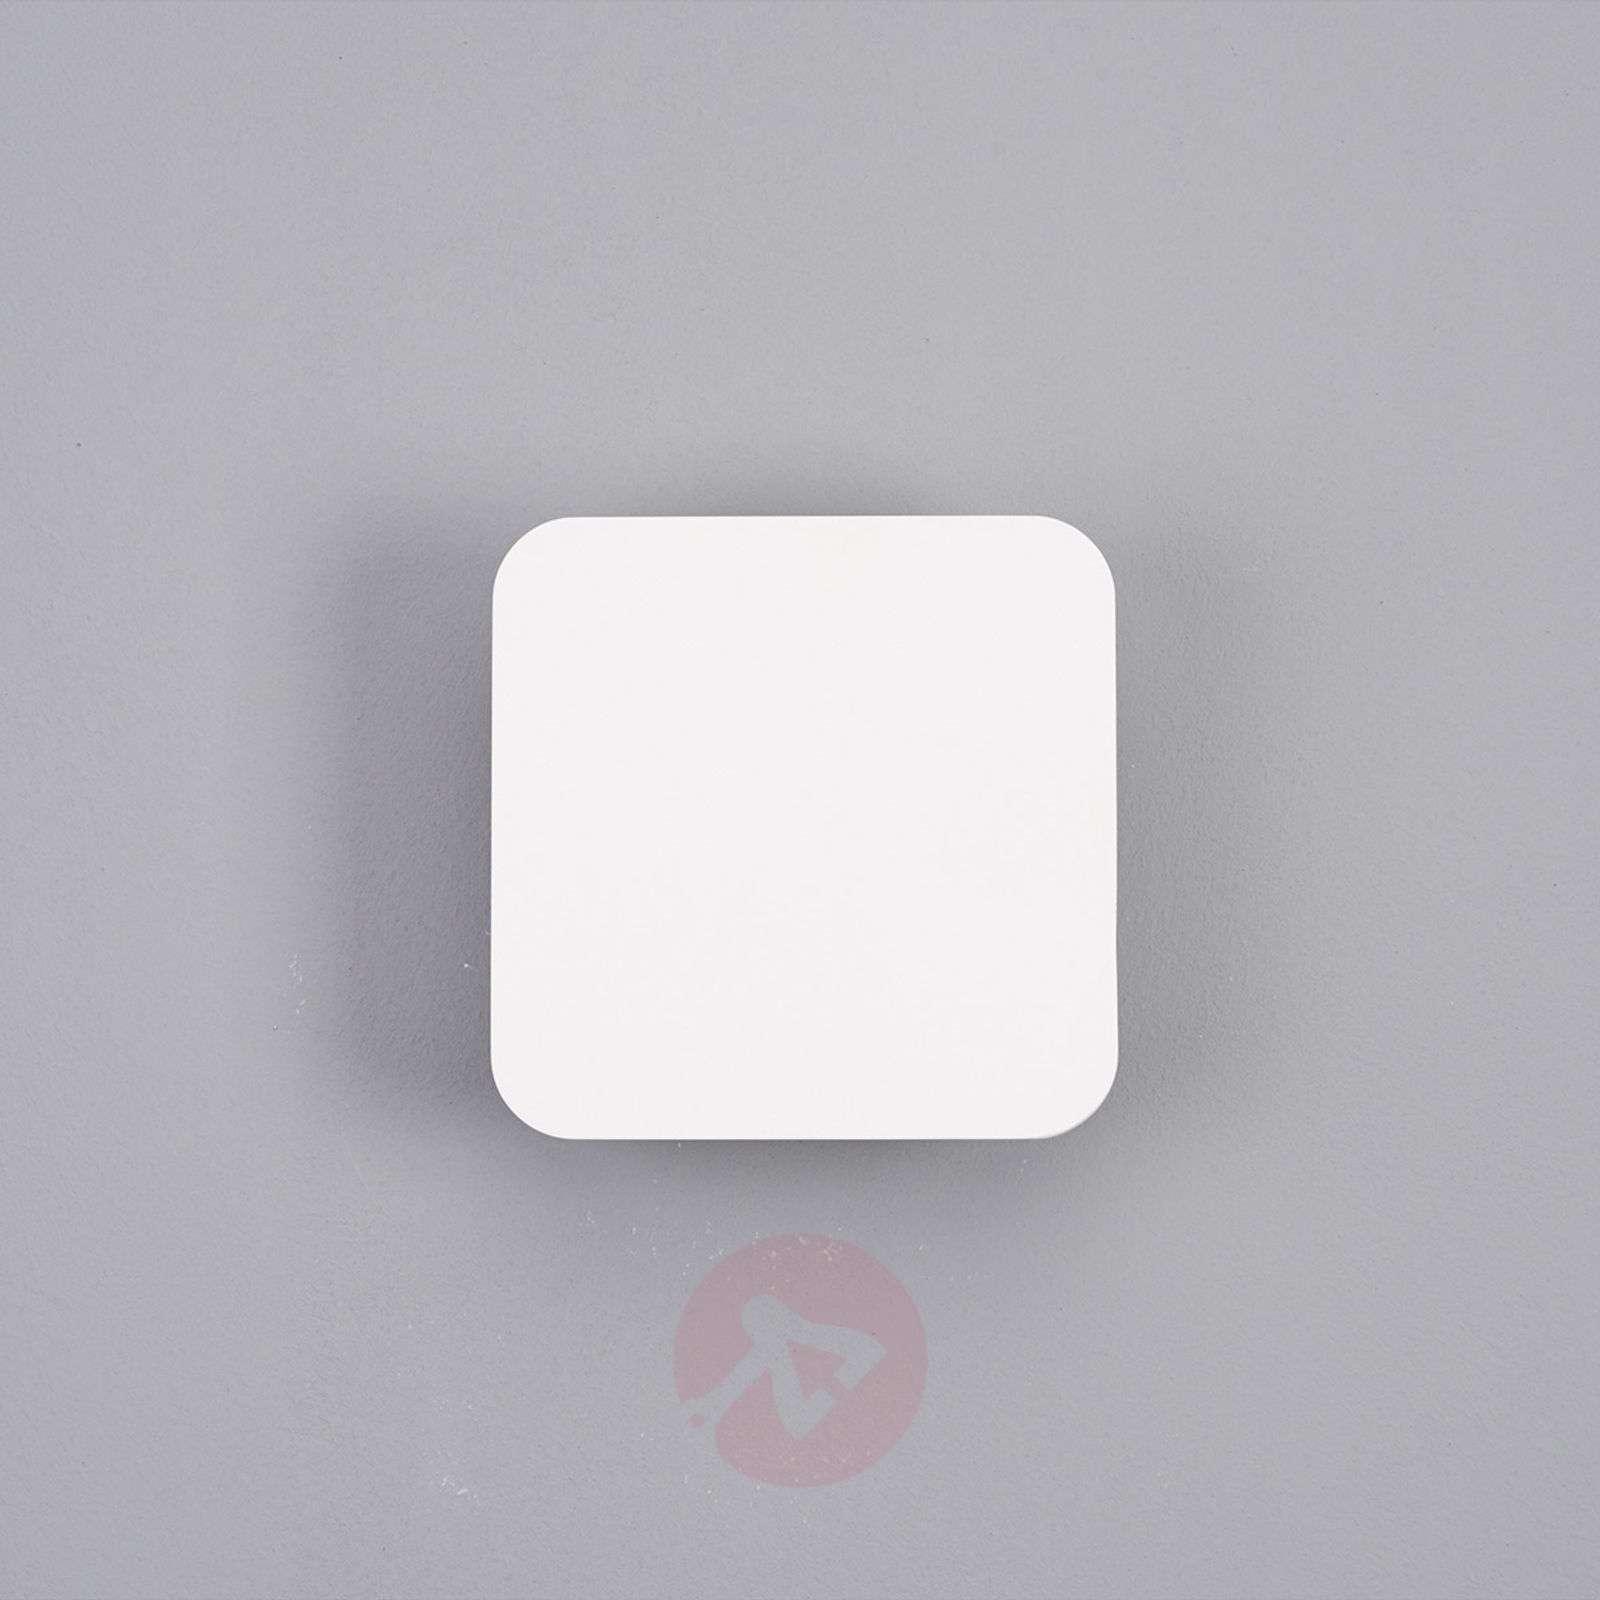 Gypsum LED Wall Light Modern Plaster-9613024-01